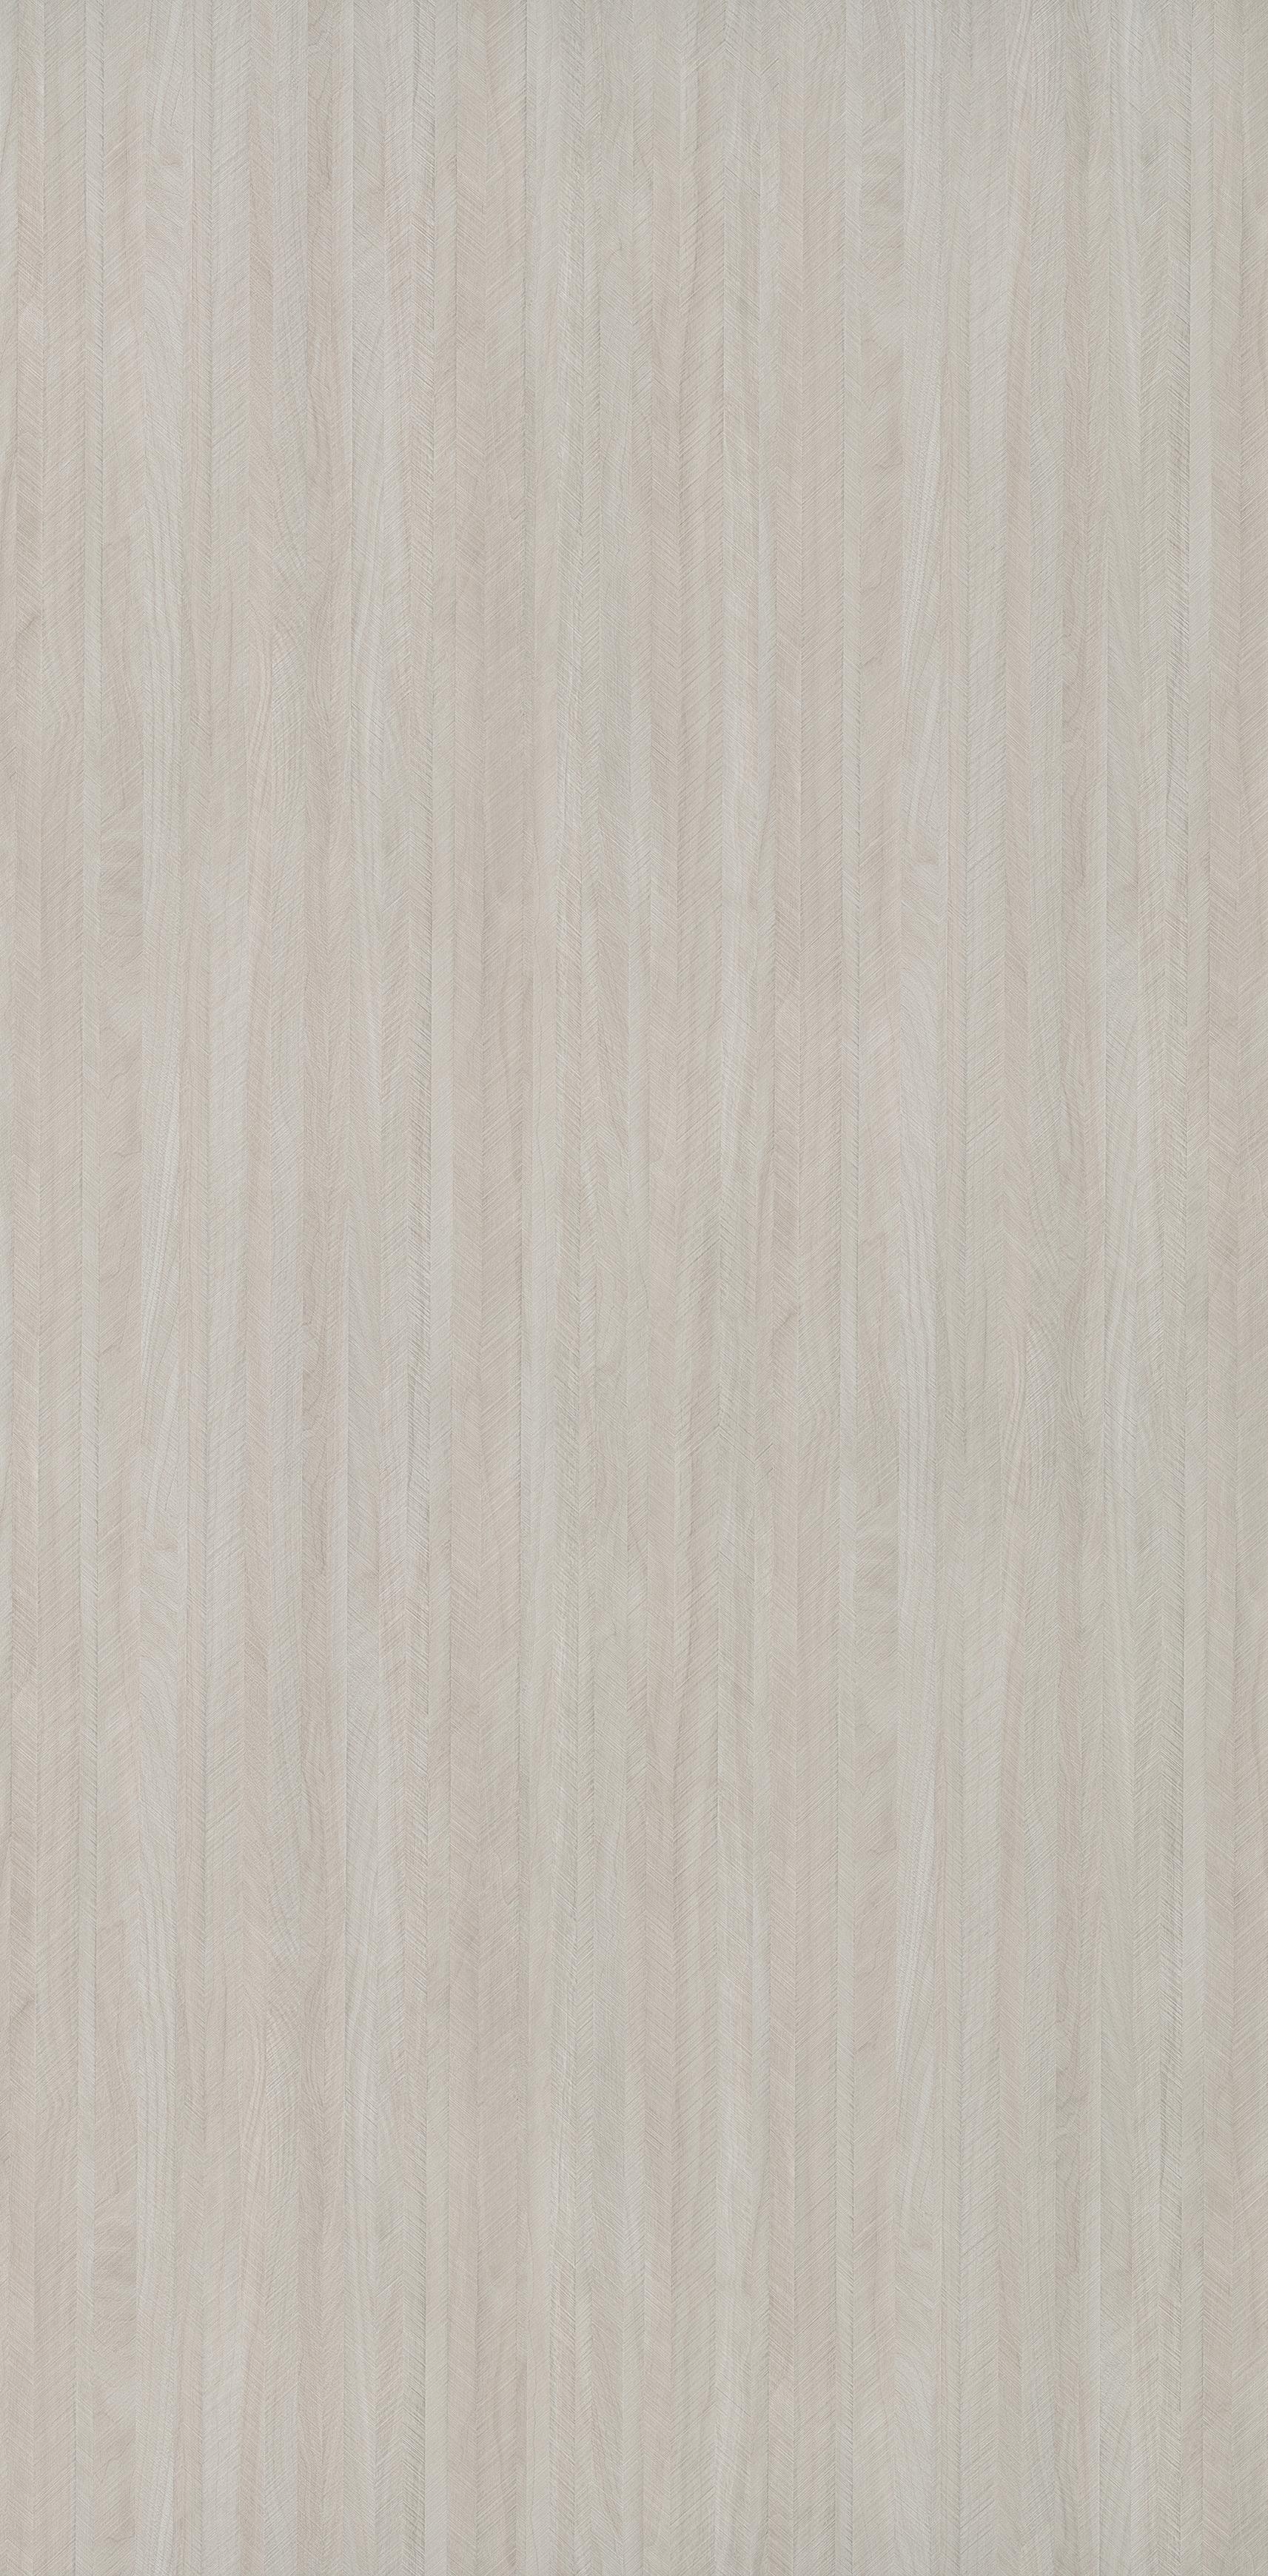 DecoLegno 5377 Dandy Wood HPL Special